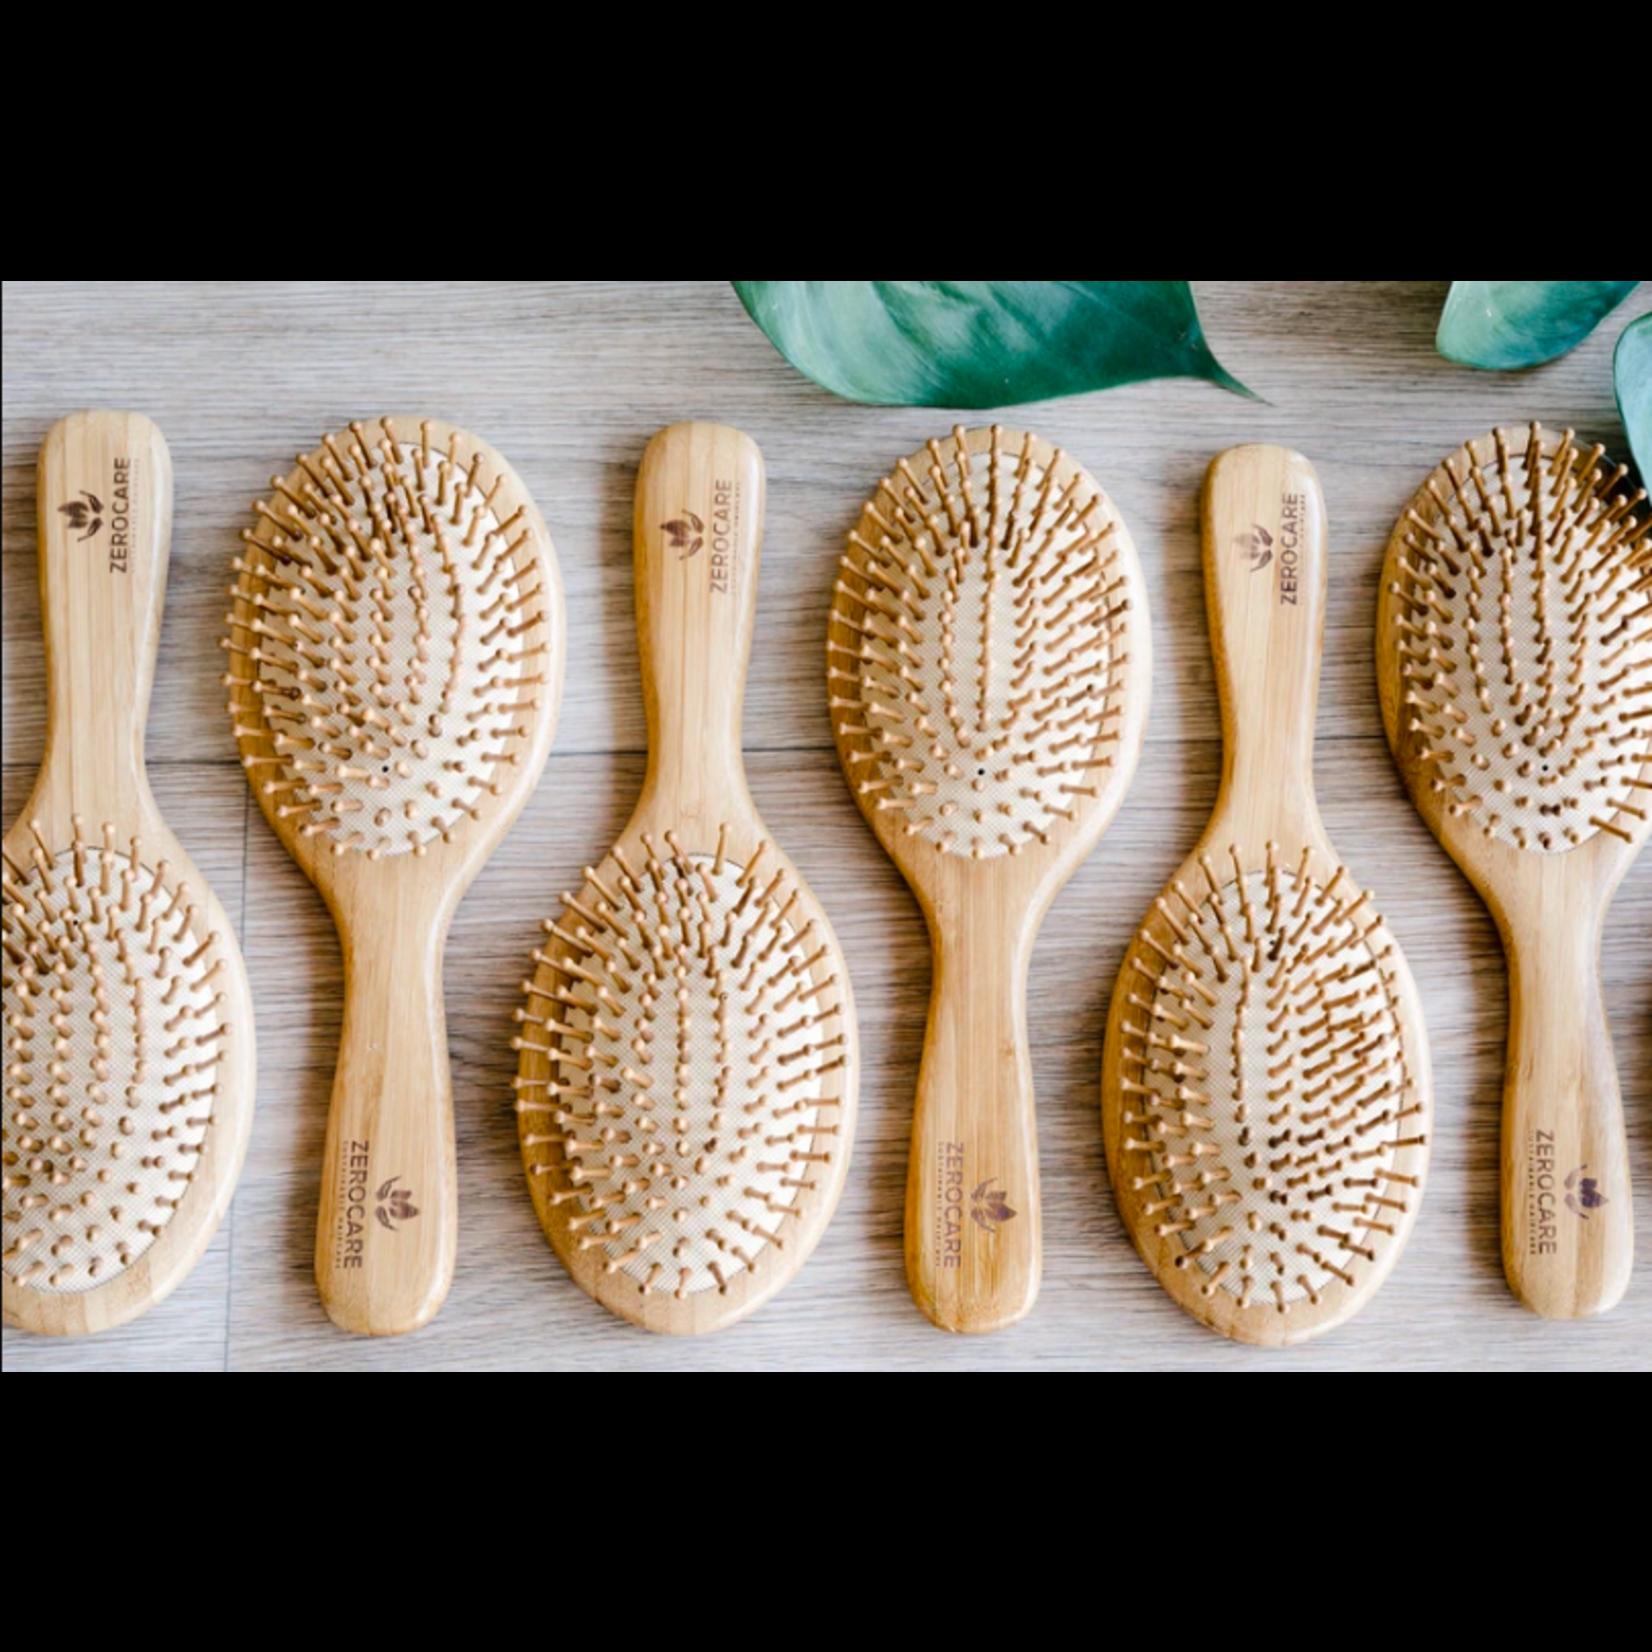 Zerocare Zerocare Bamboo Styler Brush